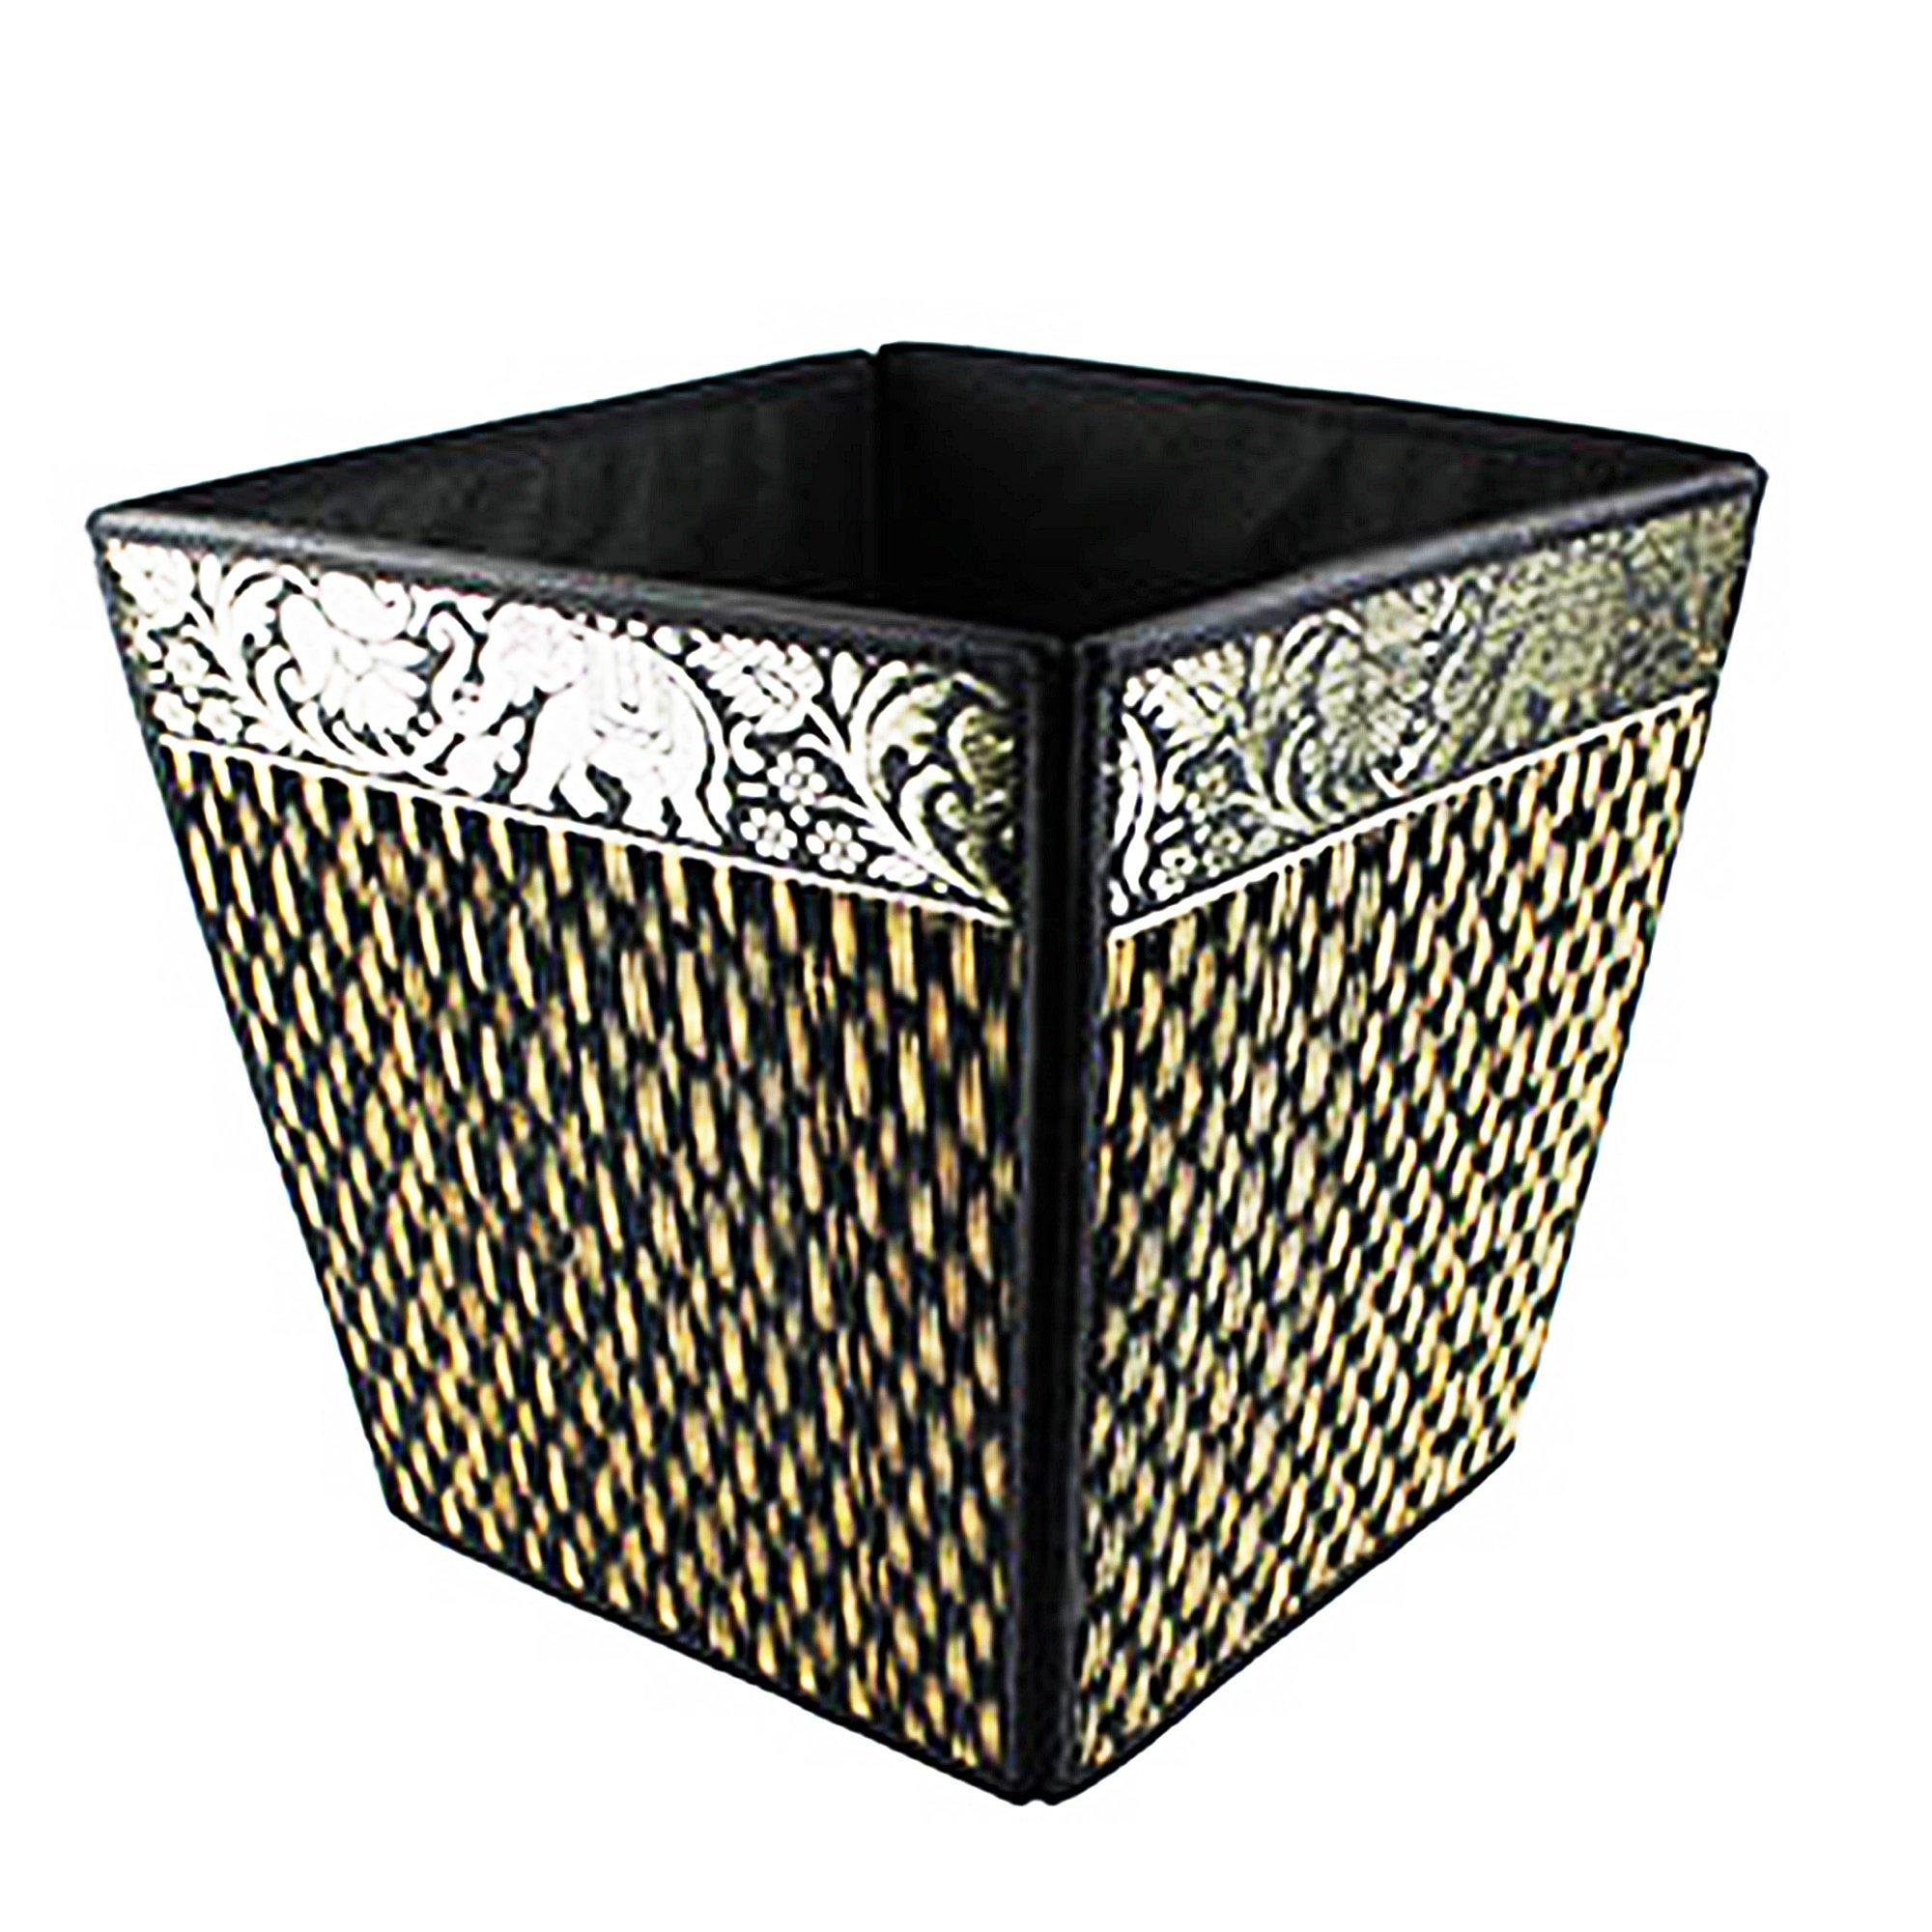 chantubtimplaza Waste Basket Thai Elephant Silk Reed Paper Bin Home Decor Black Color by chantubtimplaza